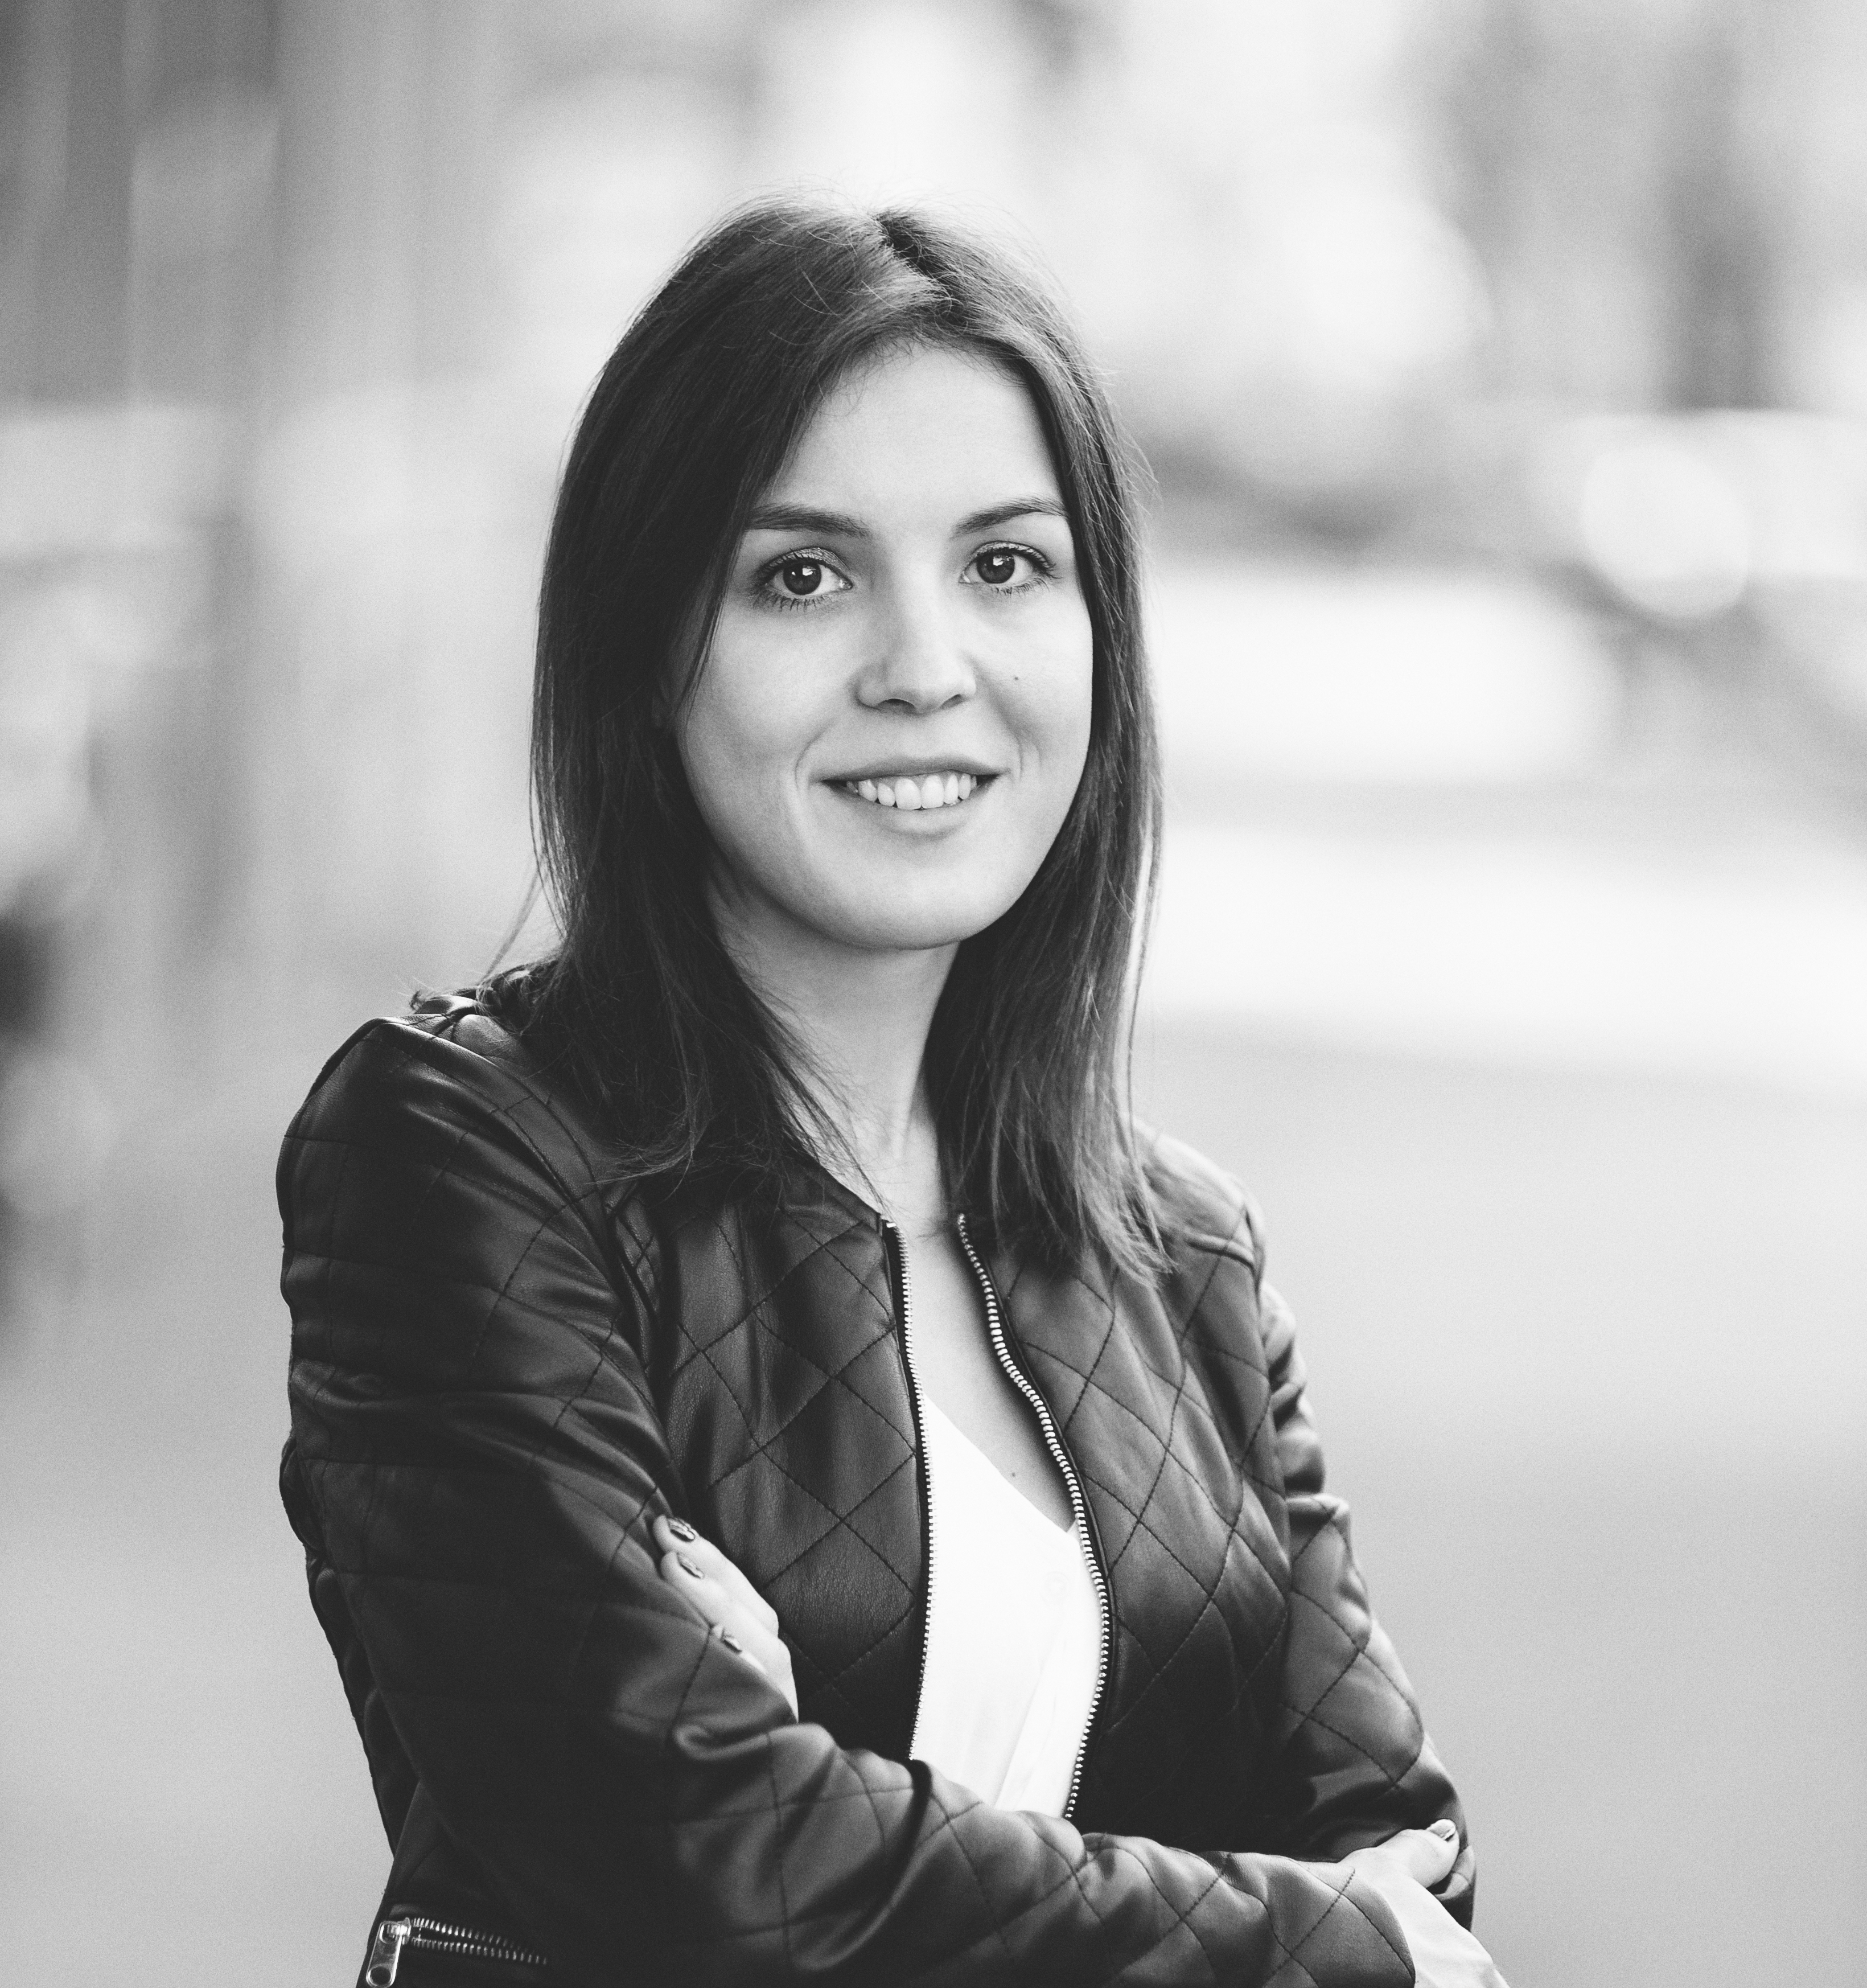 Veronika Köchl, BA